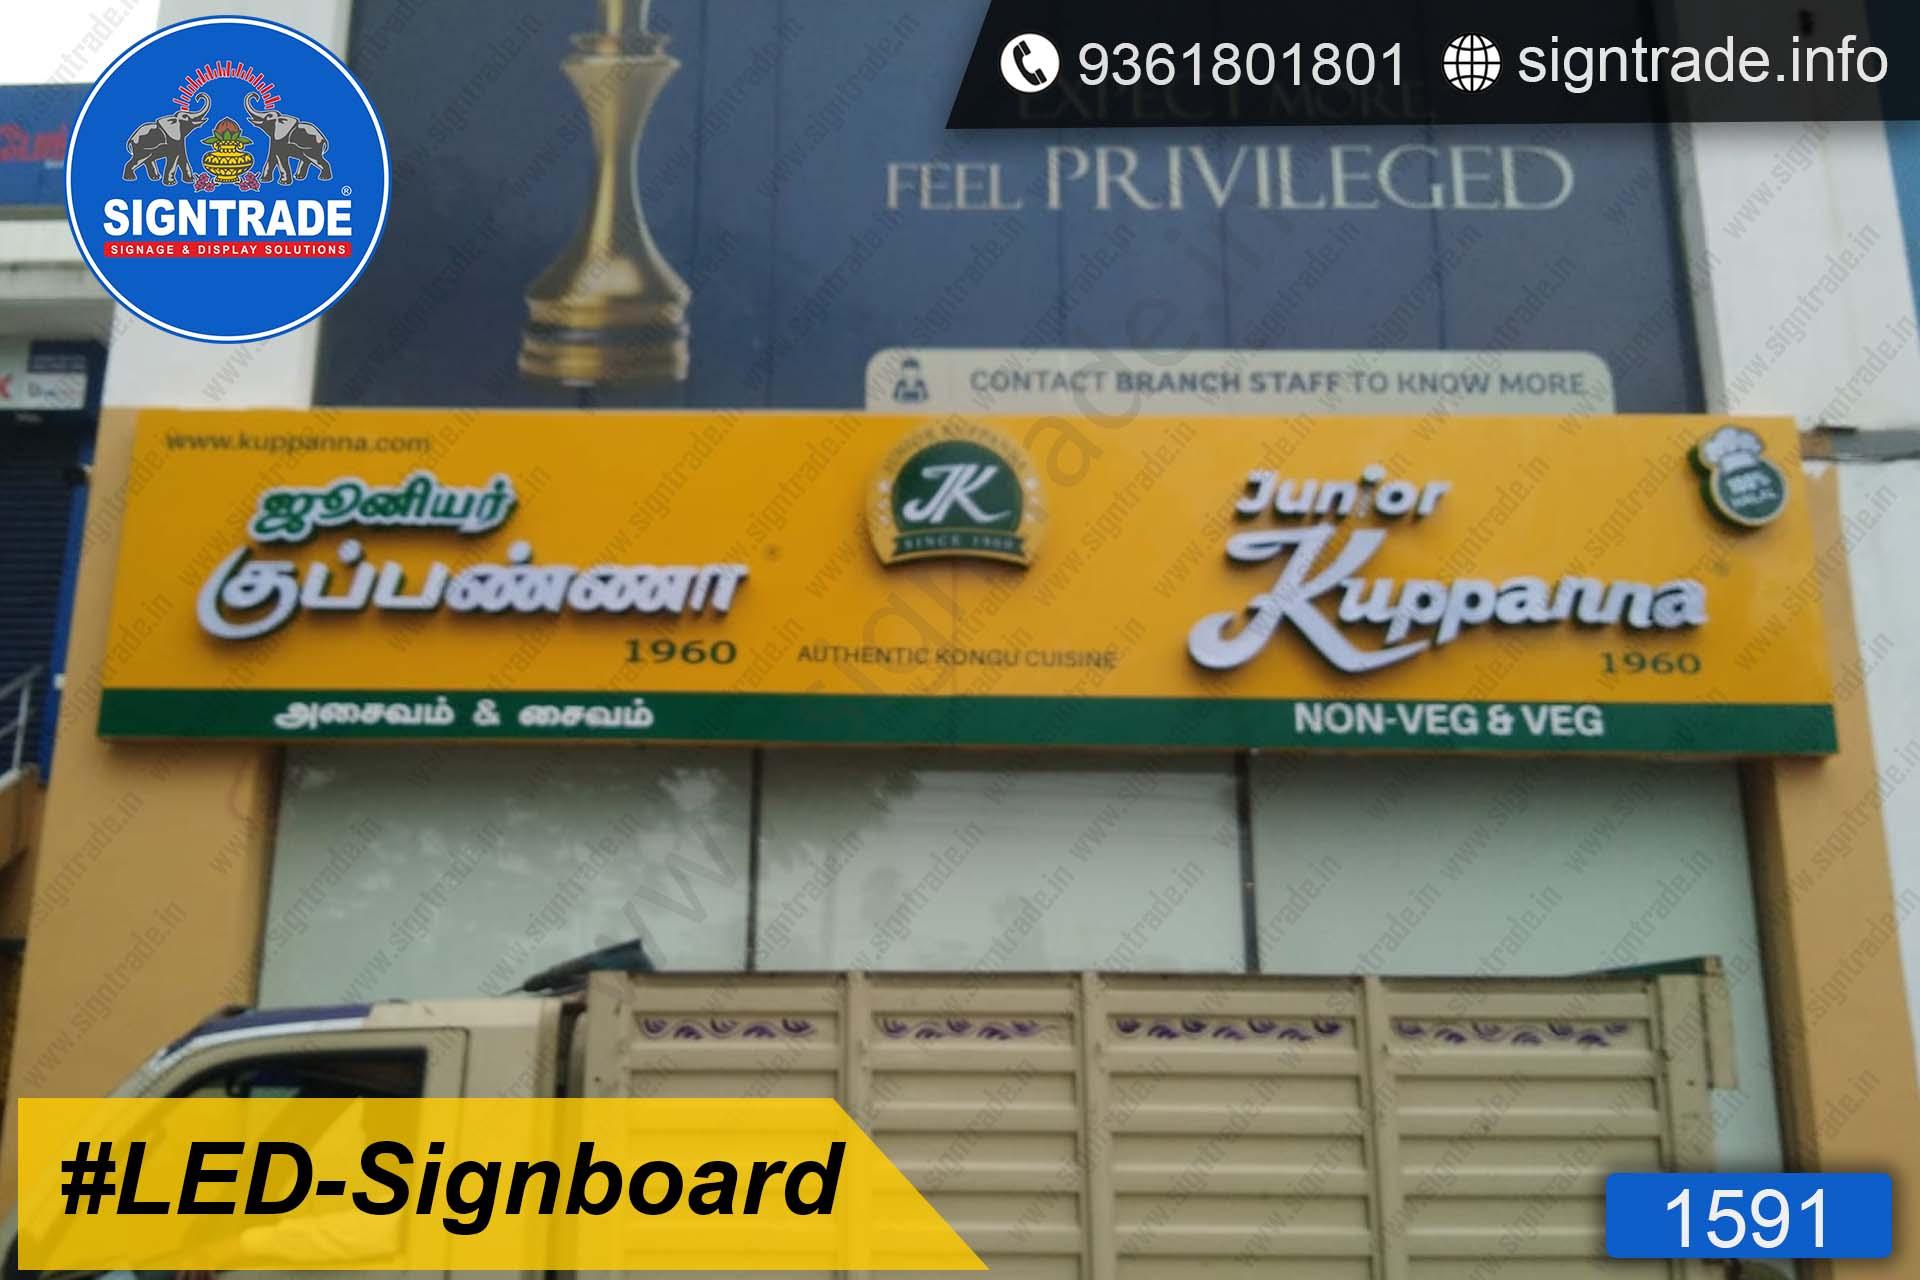 Hotel Junior Kuppanna, Chennai - SIGNTRADE - Acrylic, LED Sign Board Manufacturers in Chennai